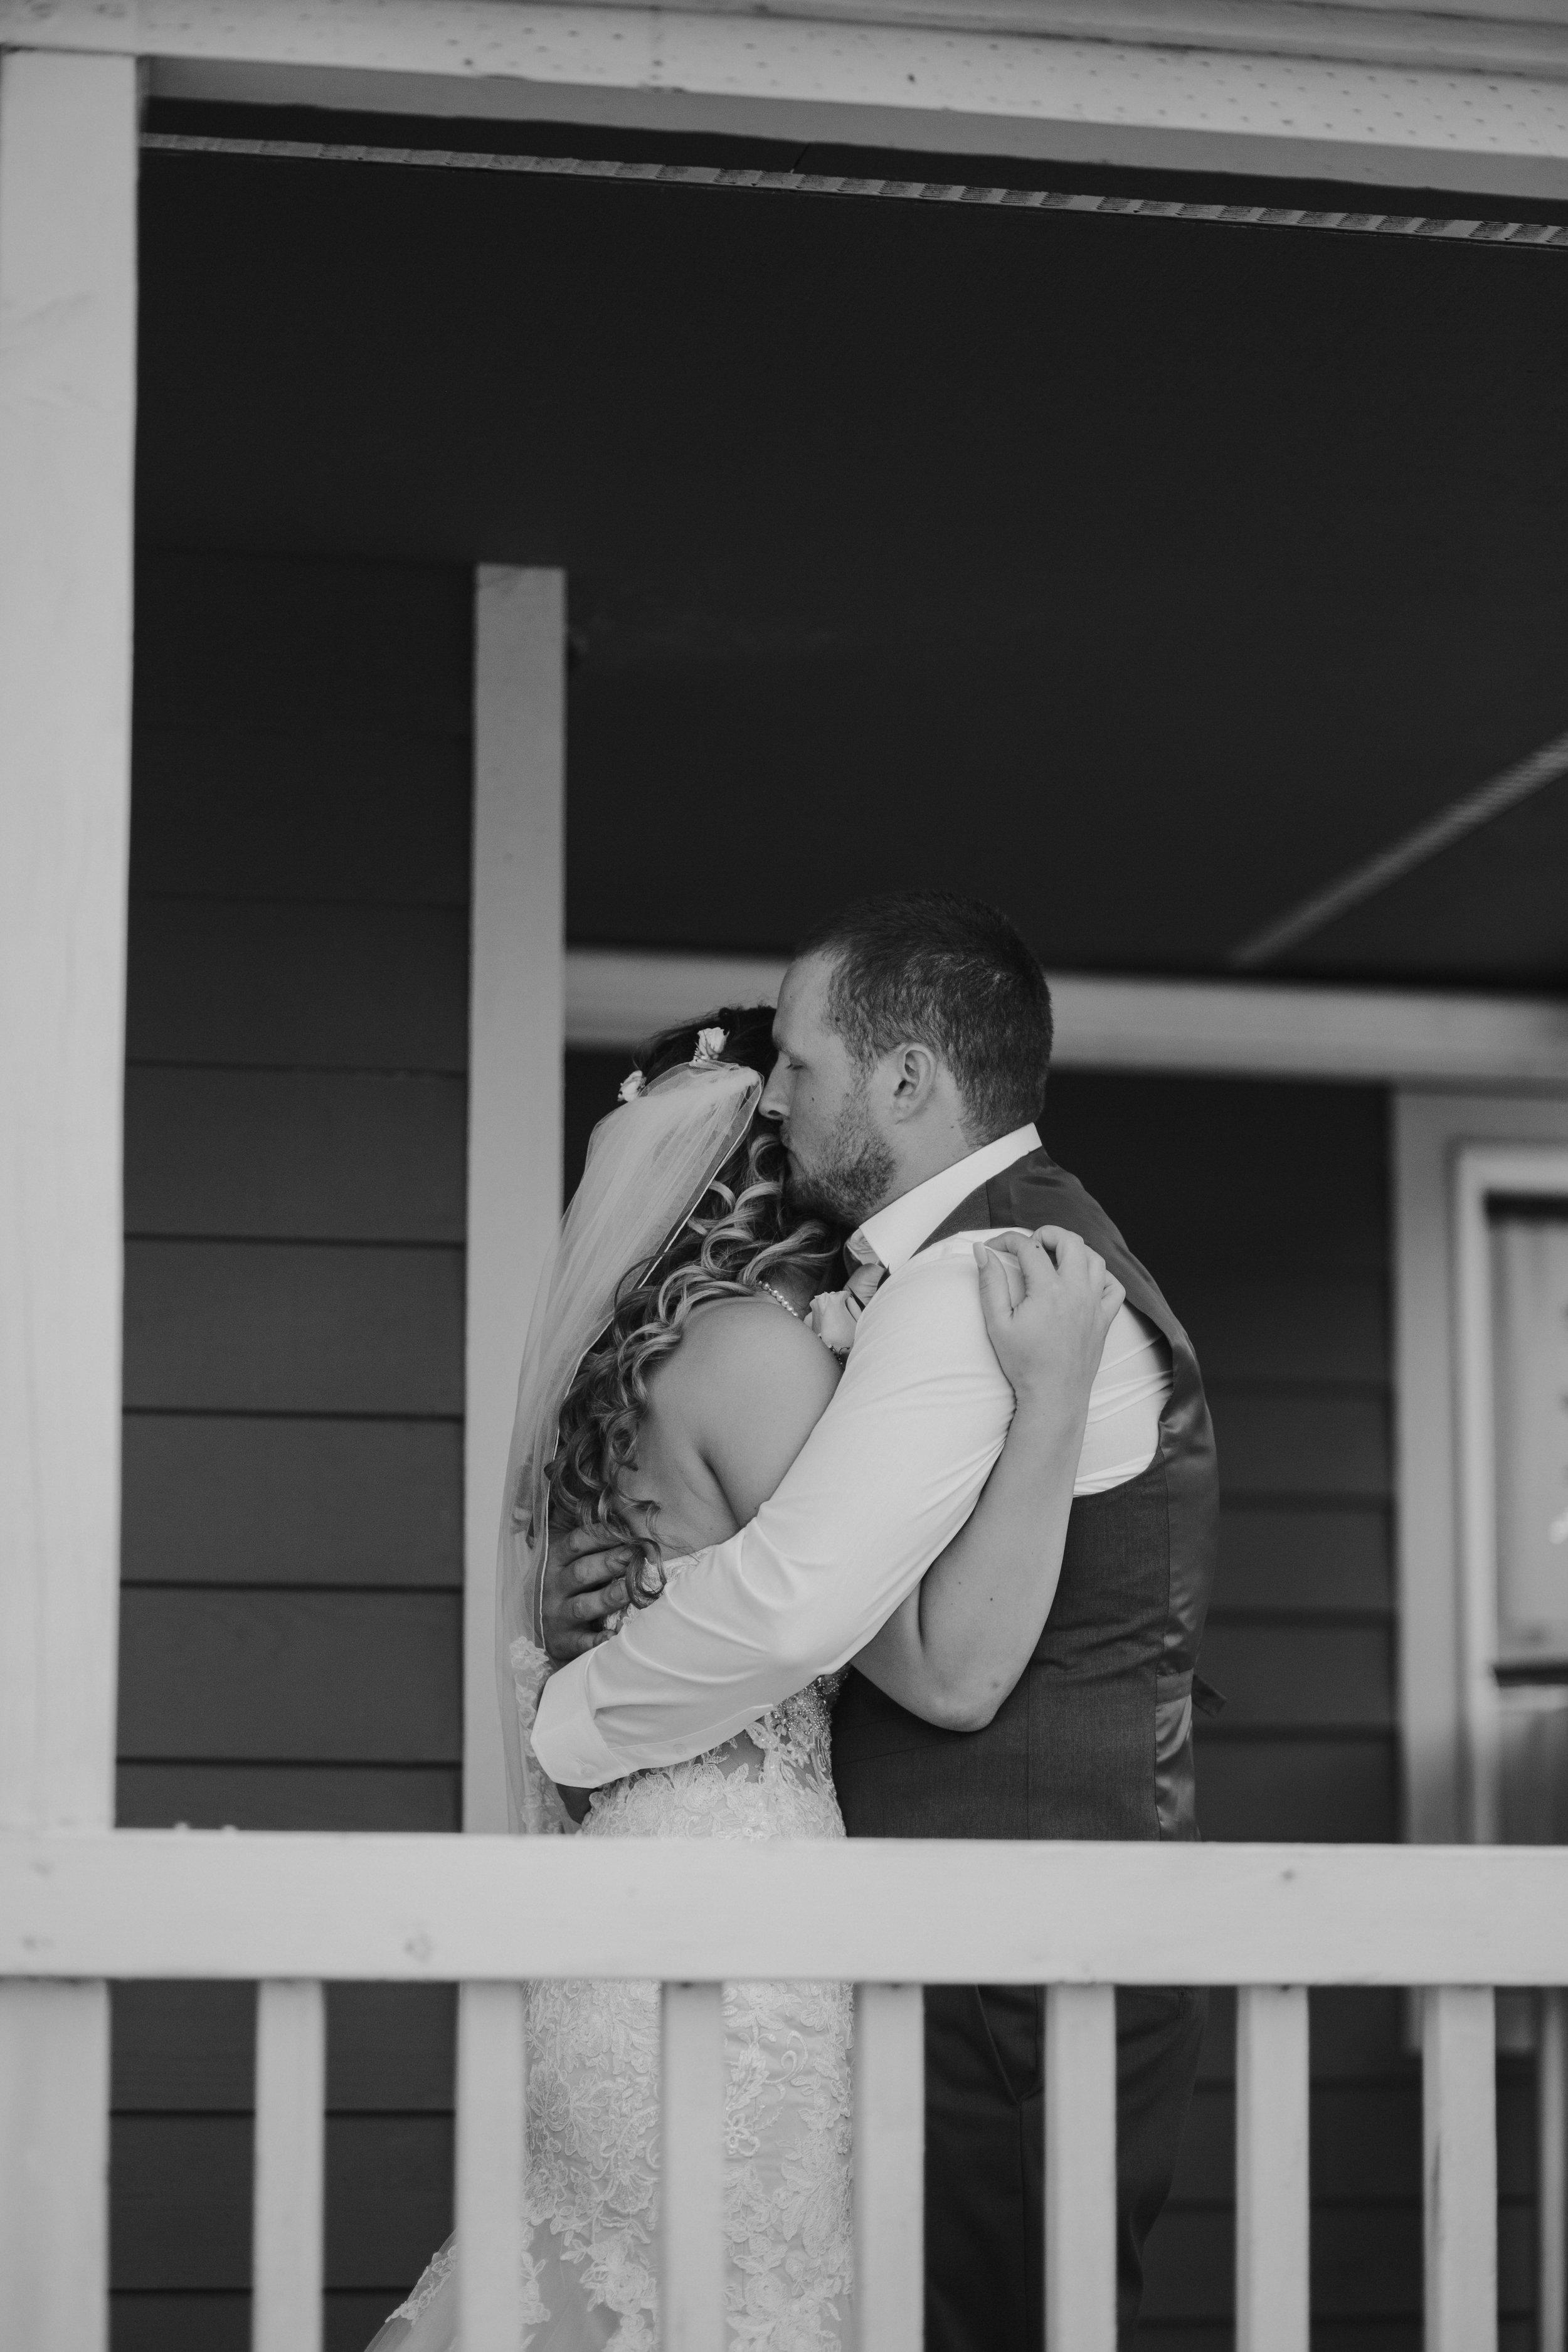 Olympic-Peninsula-Wedding-Photographer-PNW-Forks-Port-Angeles-Kayla-Dawn-Photography-engagement-Olympic-National-Park-155.jpg